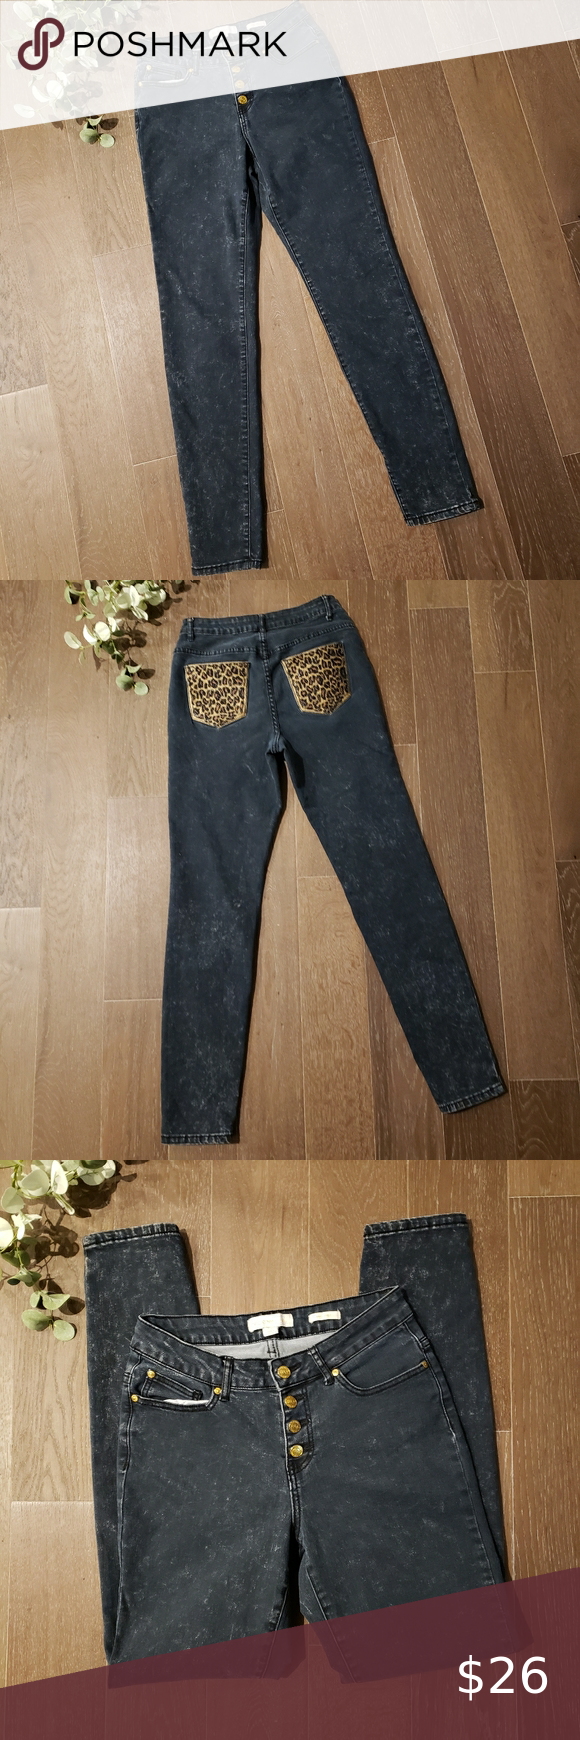 Nicki Minaj Leopard Pocket Mid Rise Jeans Nicki Minaj Leopard Pocket Mid Rise Jeans Skinny Blackstone Wash Je In 2020 Womens Jeans Skinny Mid Rise Jeans Clothes Design